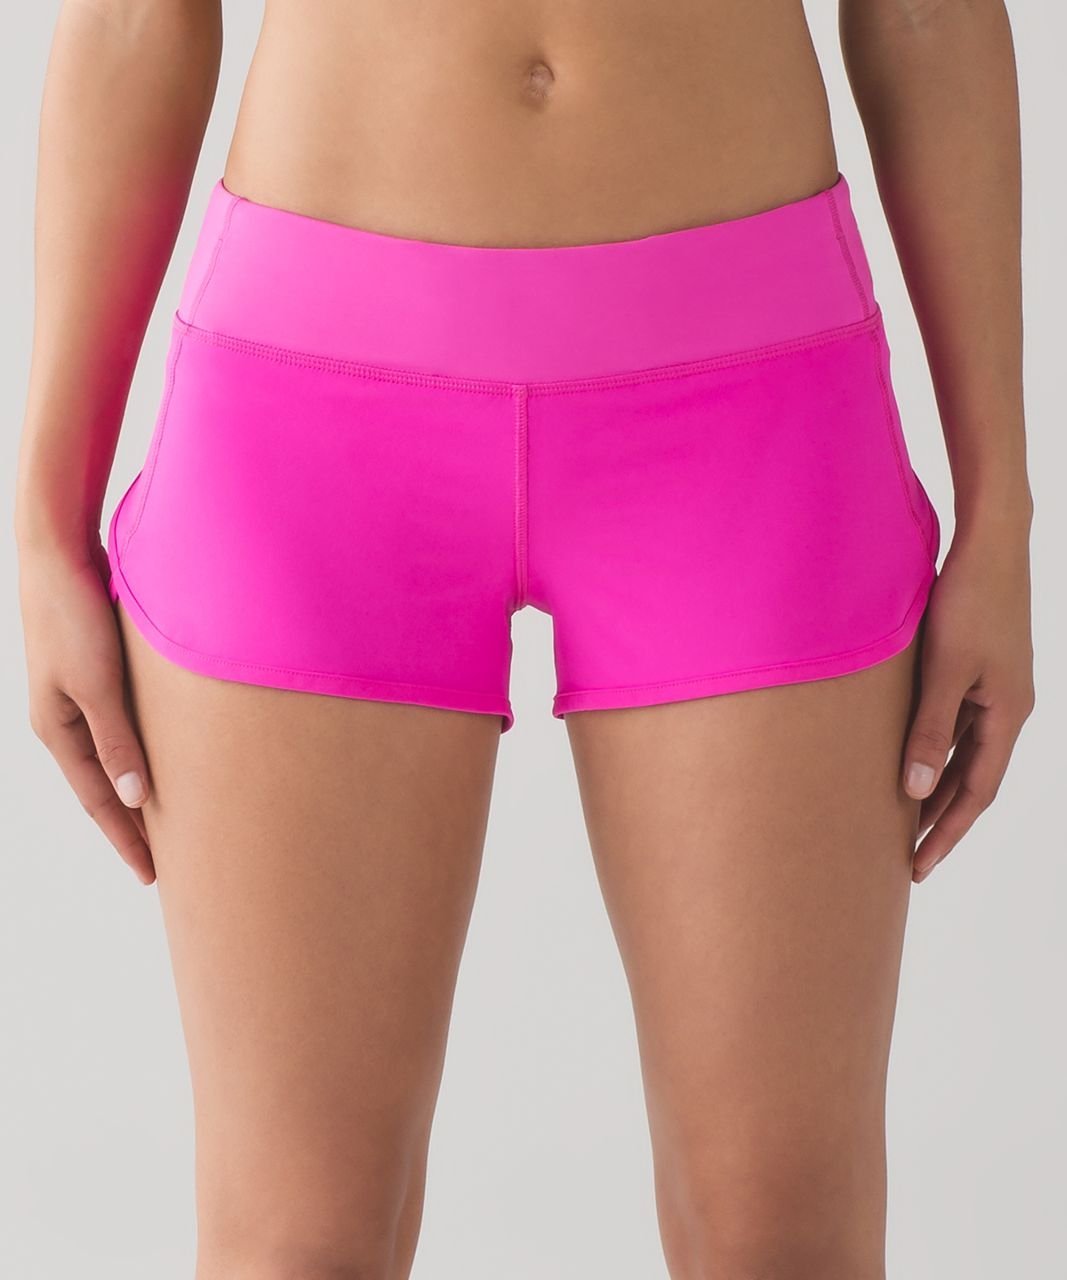 "Lululemon Speed Short *4-way Stretch 2.5"" - Pow Pink"